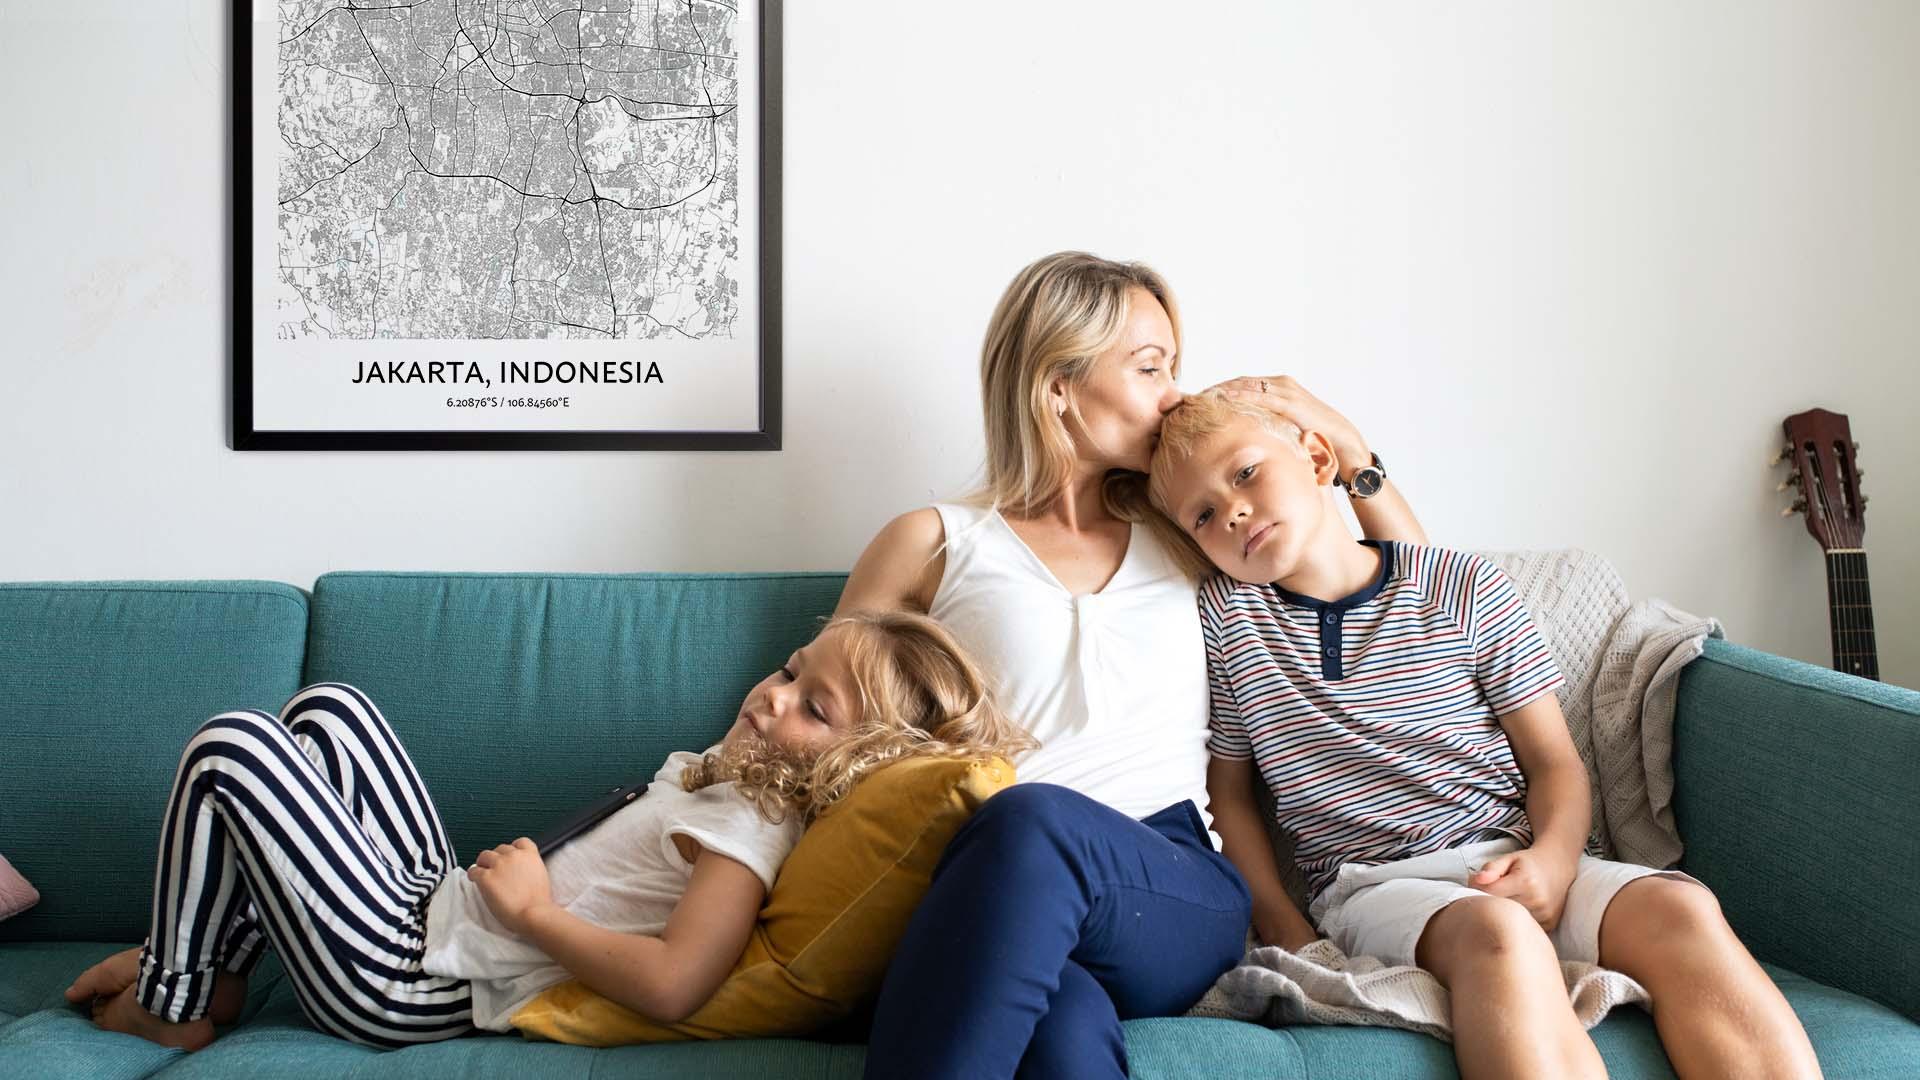 Jakarta map poster